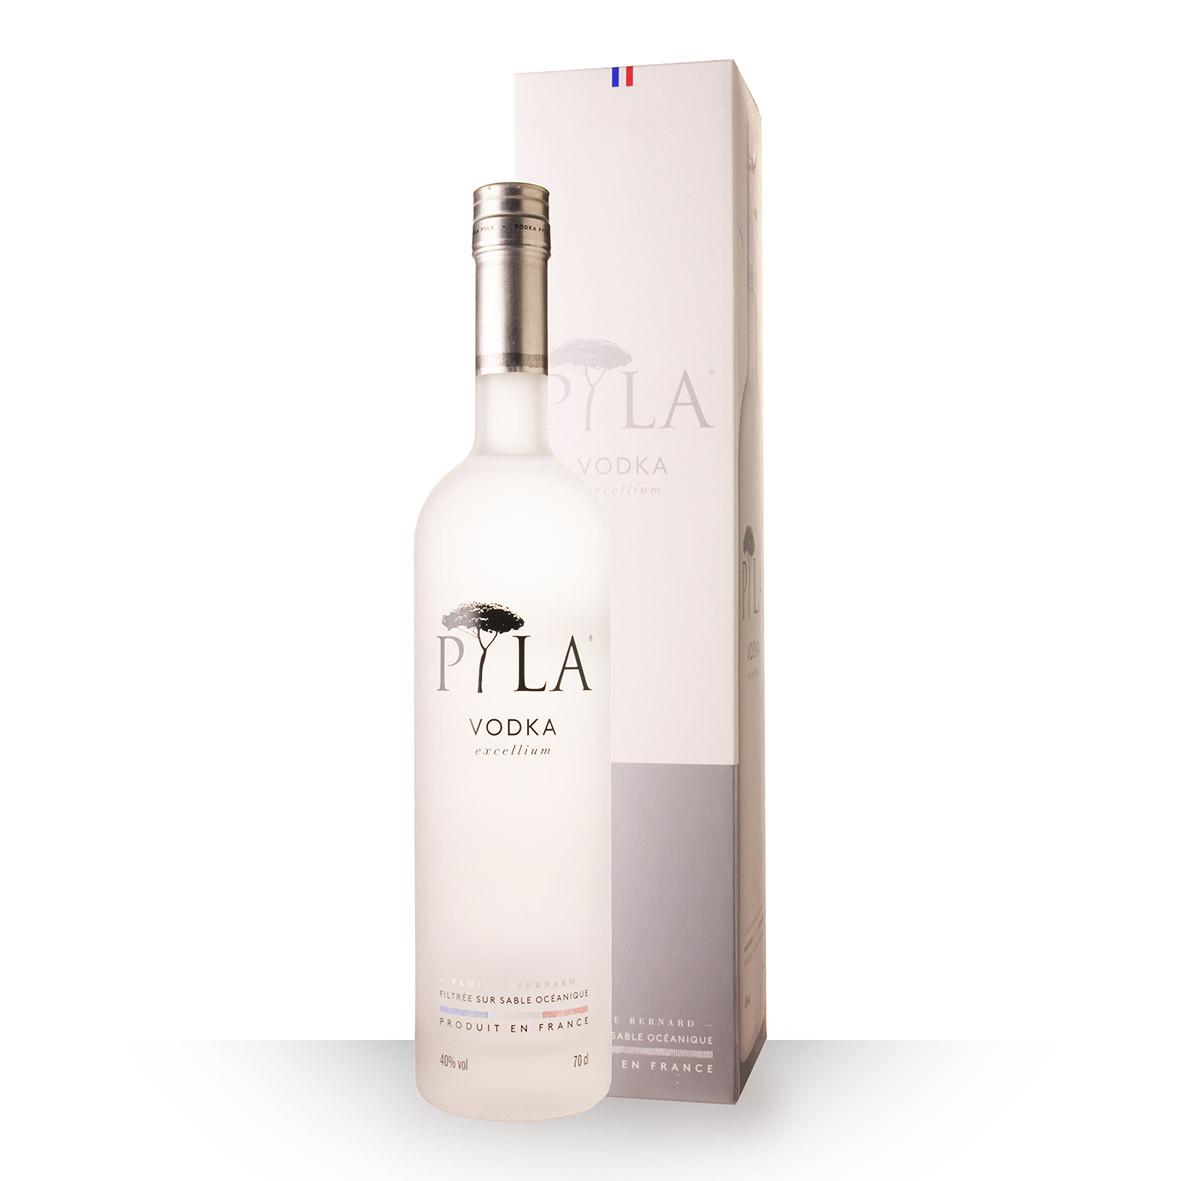 Vodka Pyla 70cl Coffret www.odyssee-vins.com